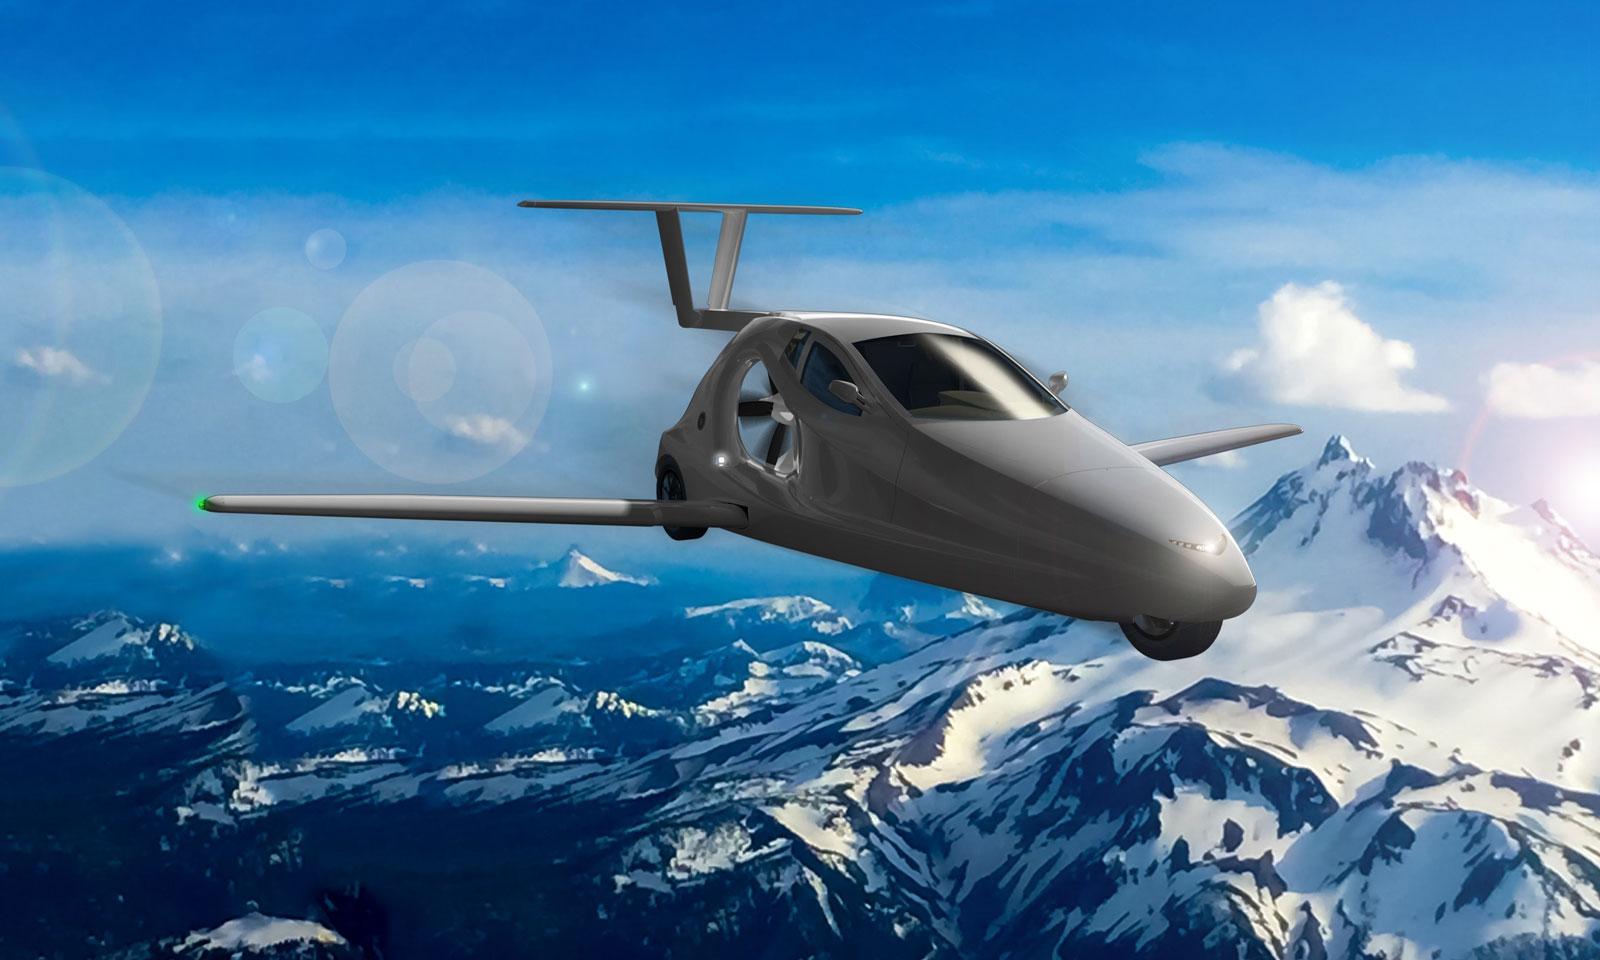 Samson flying sports car